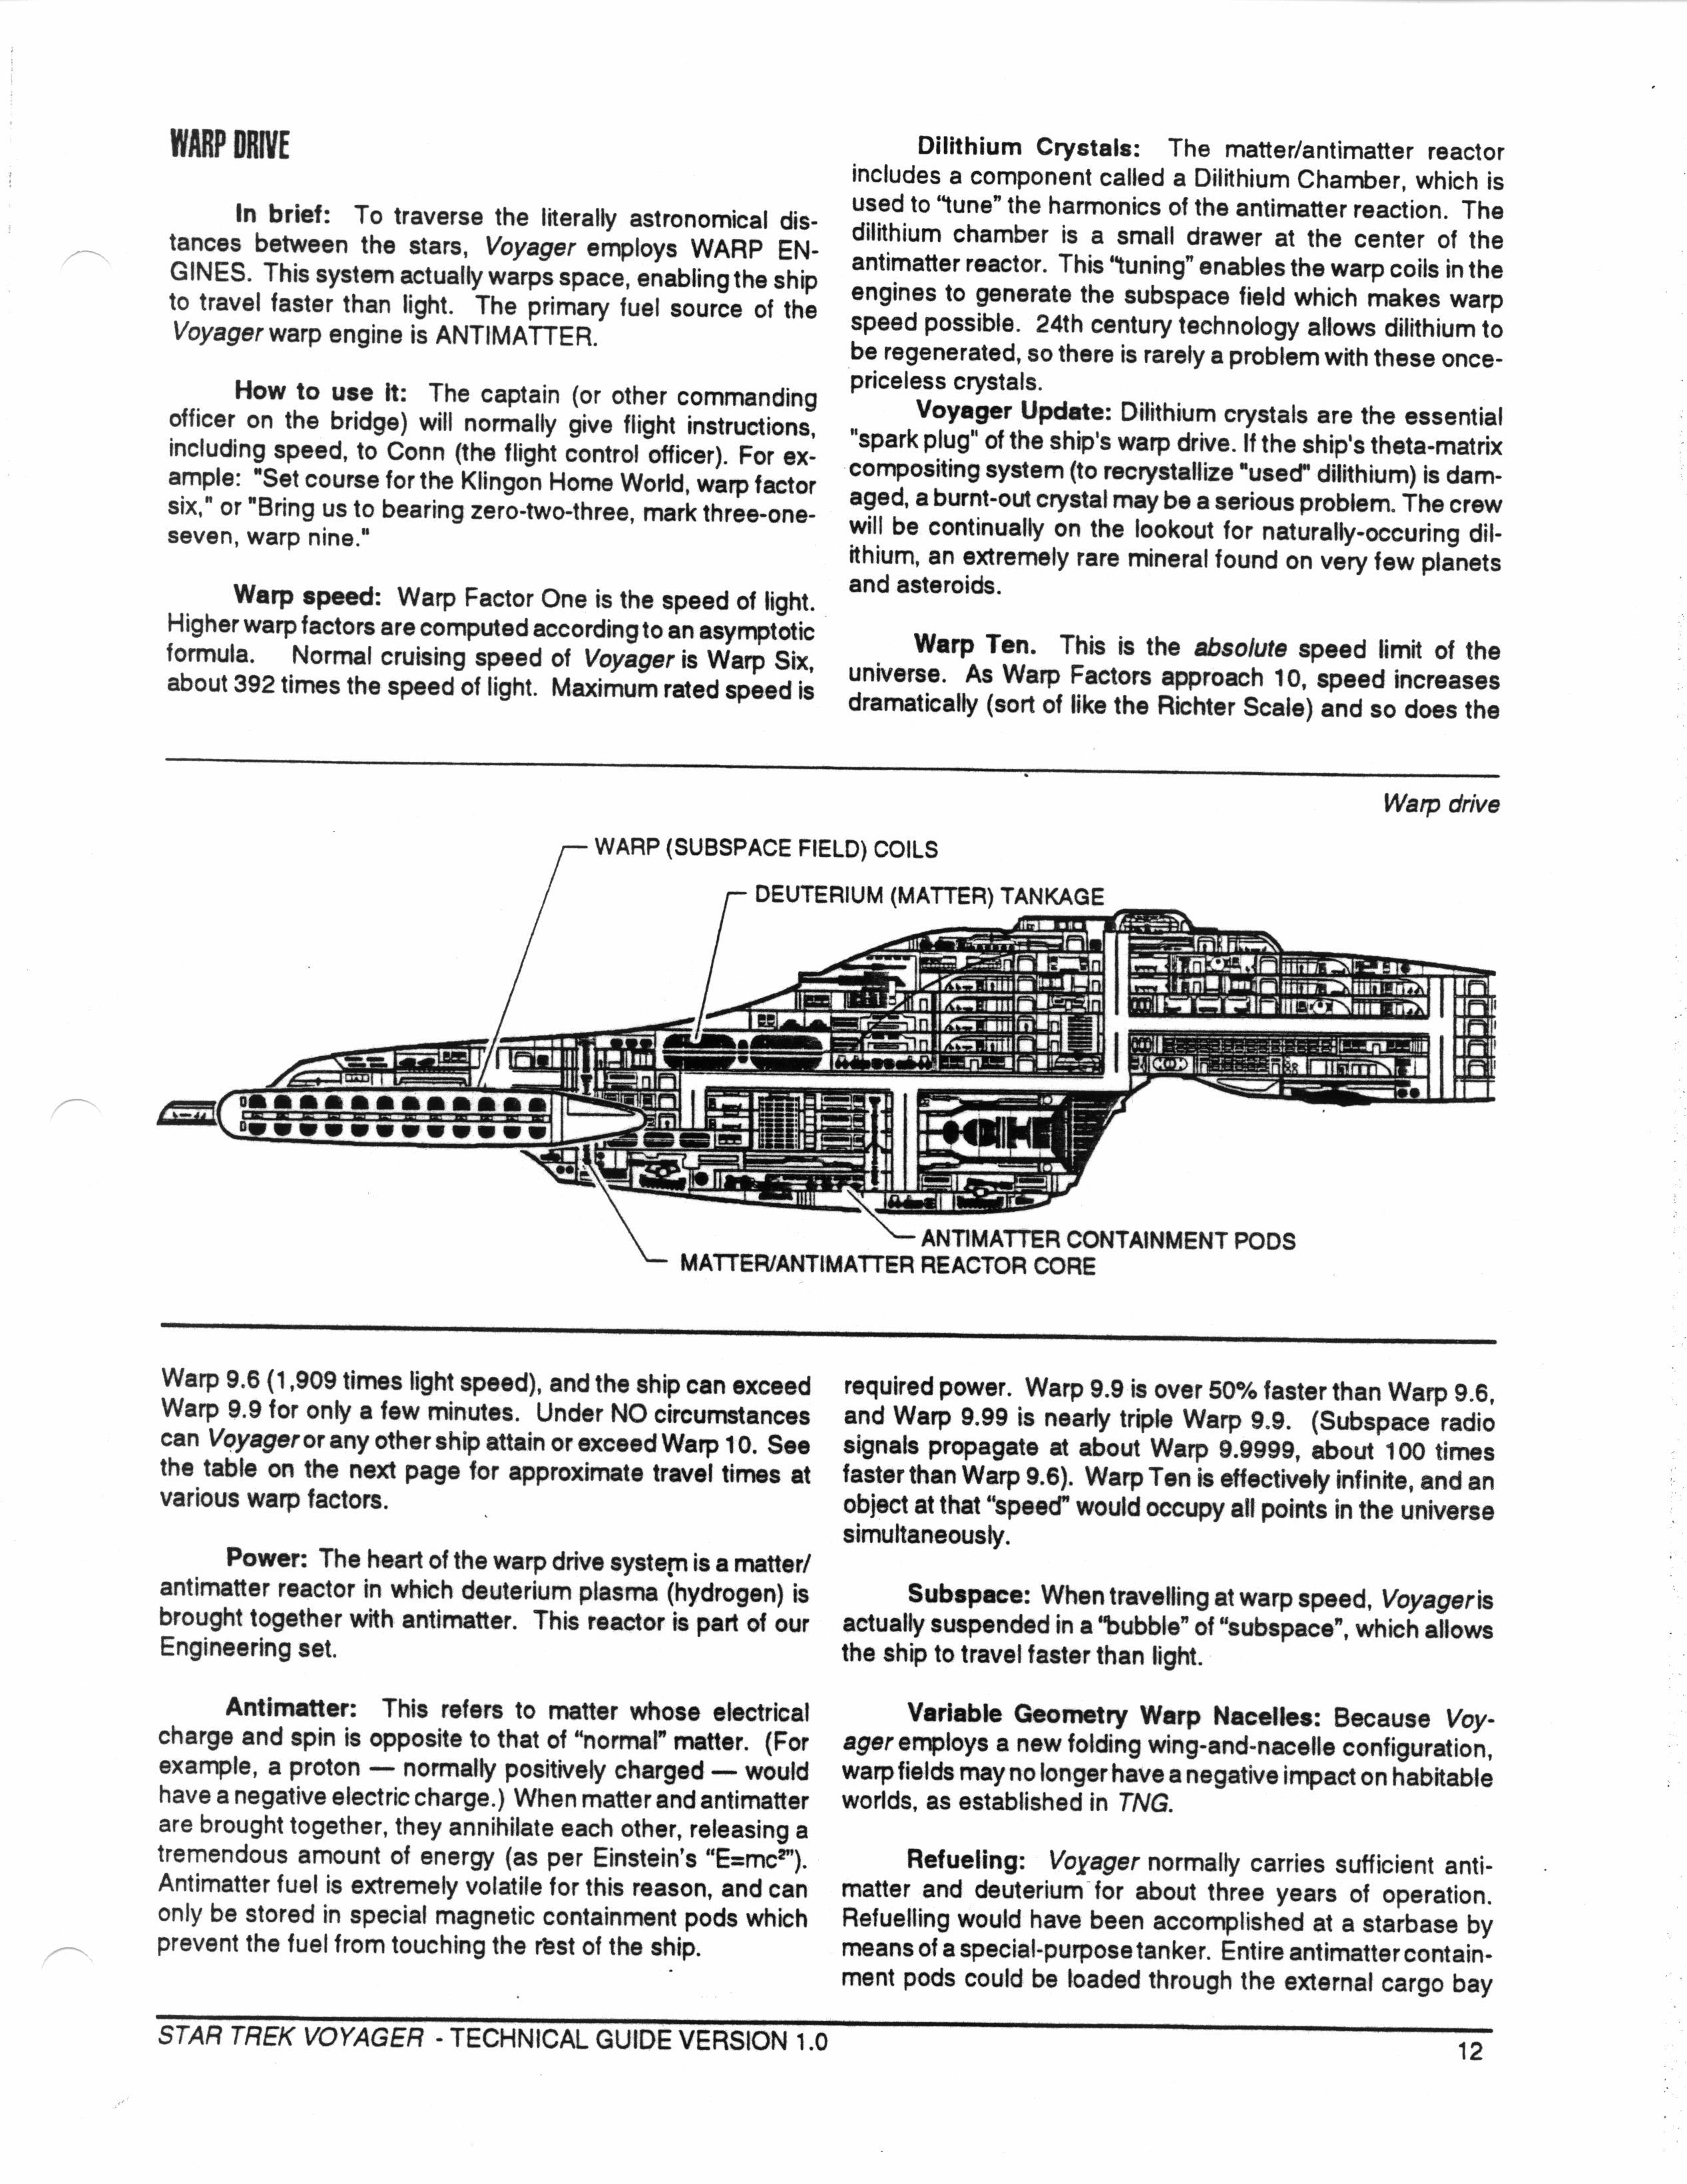 Goodman Technical Manual Manual Guide